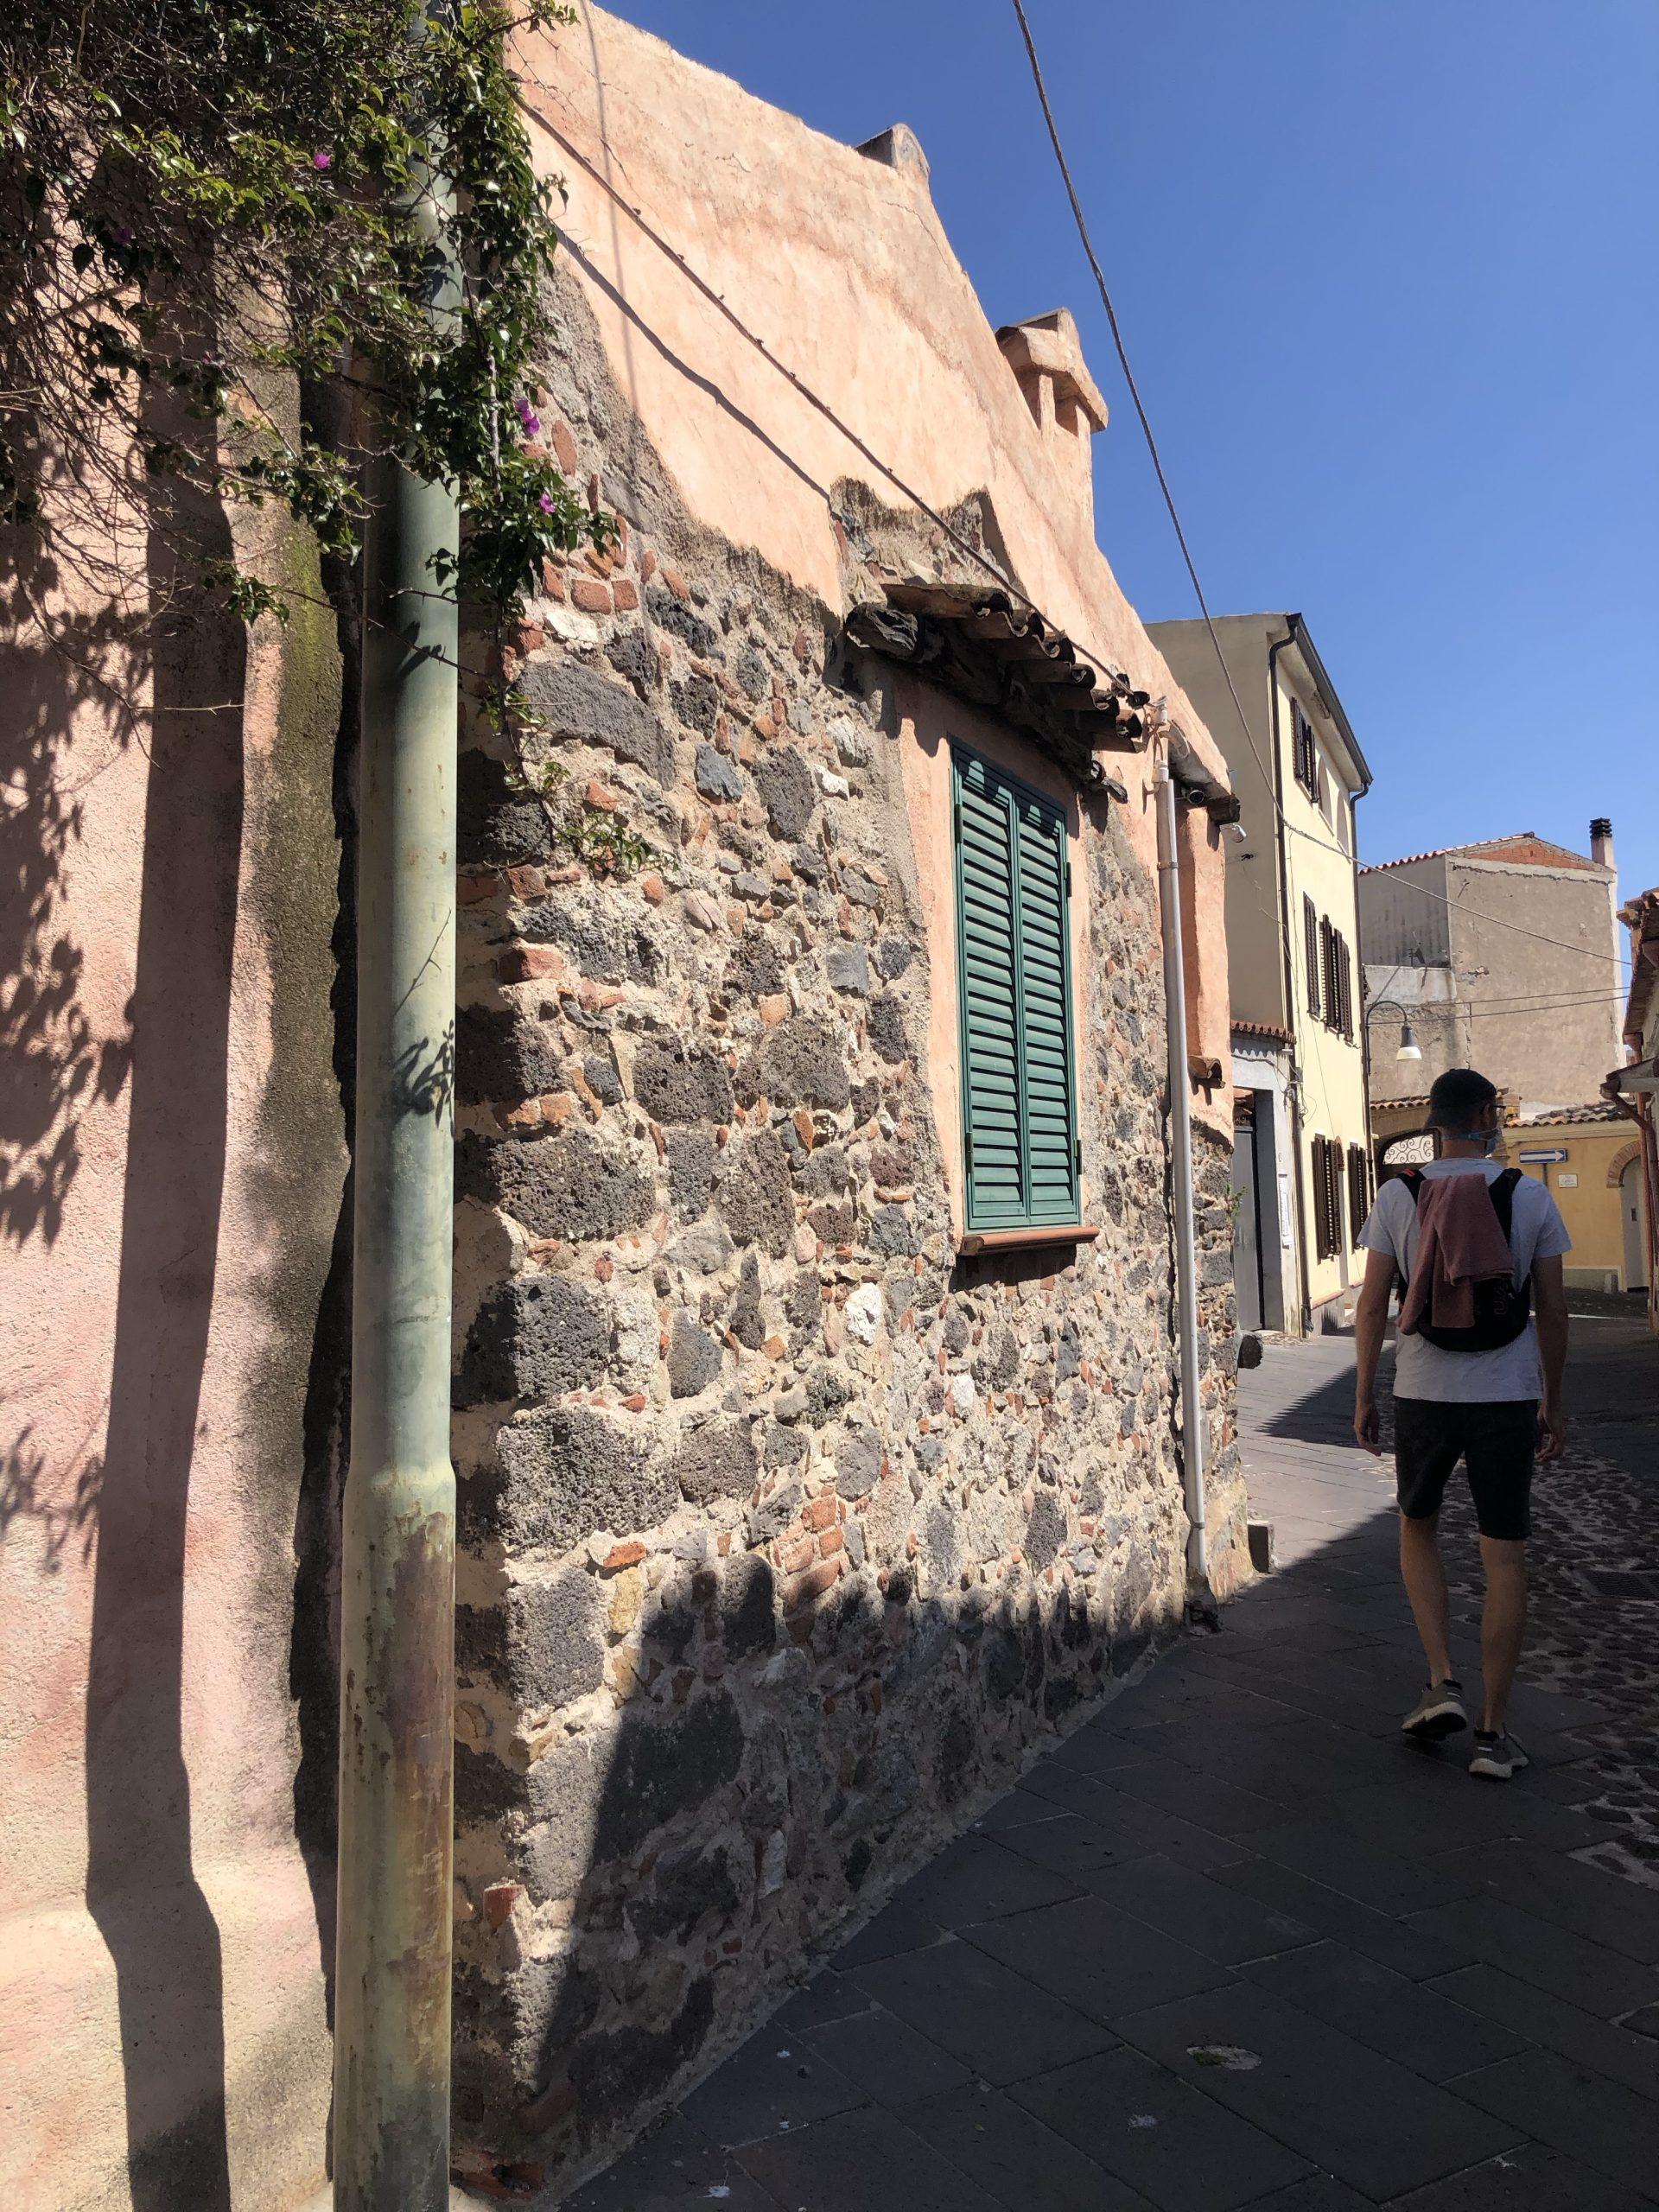 Charmante straatjes in Orosei, Sardinië